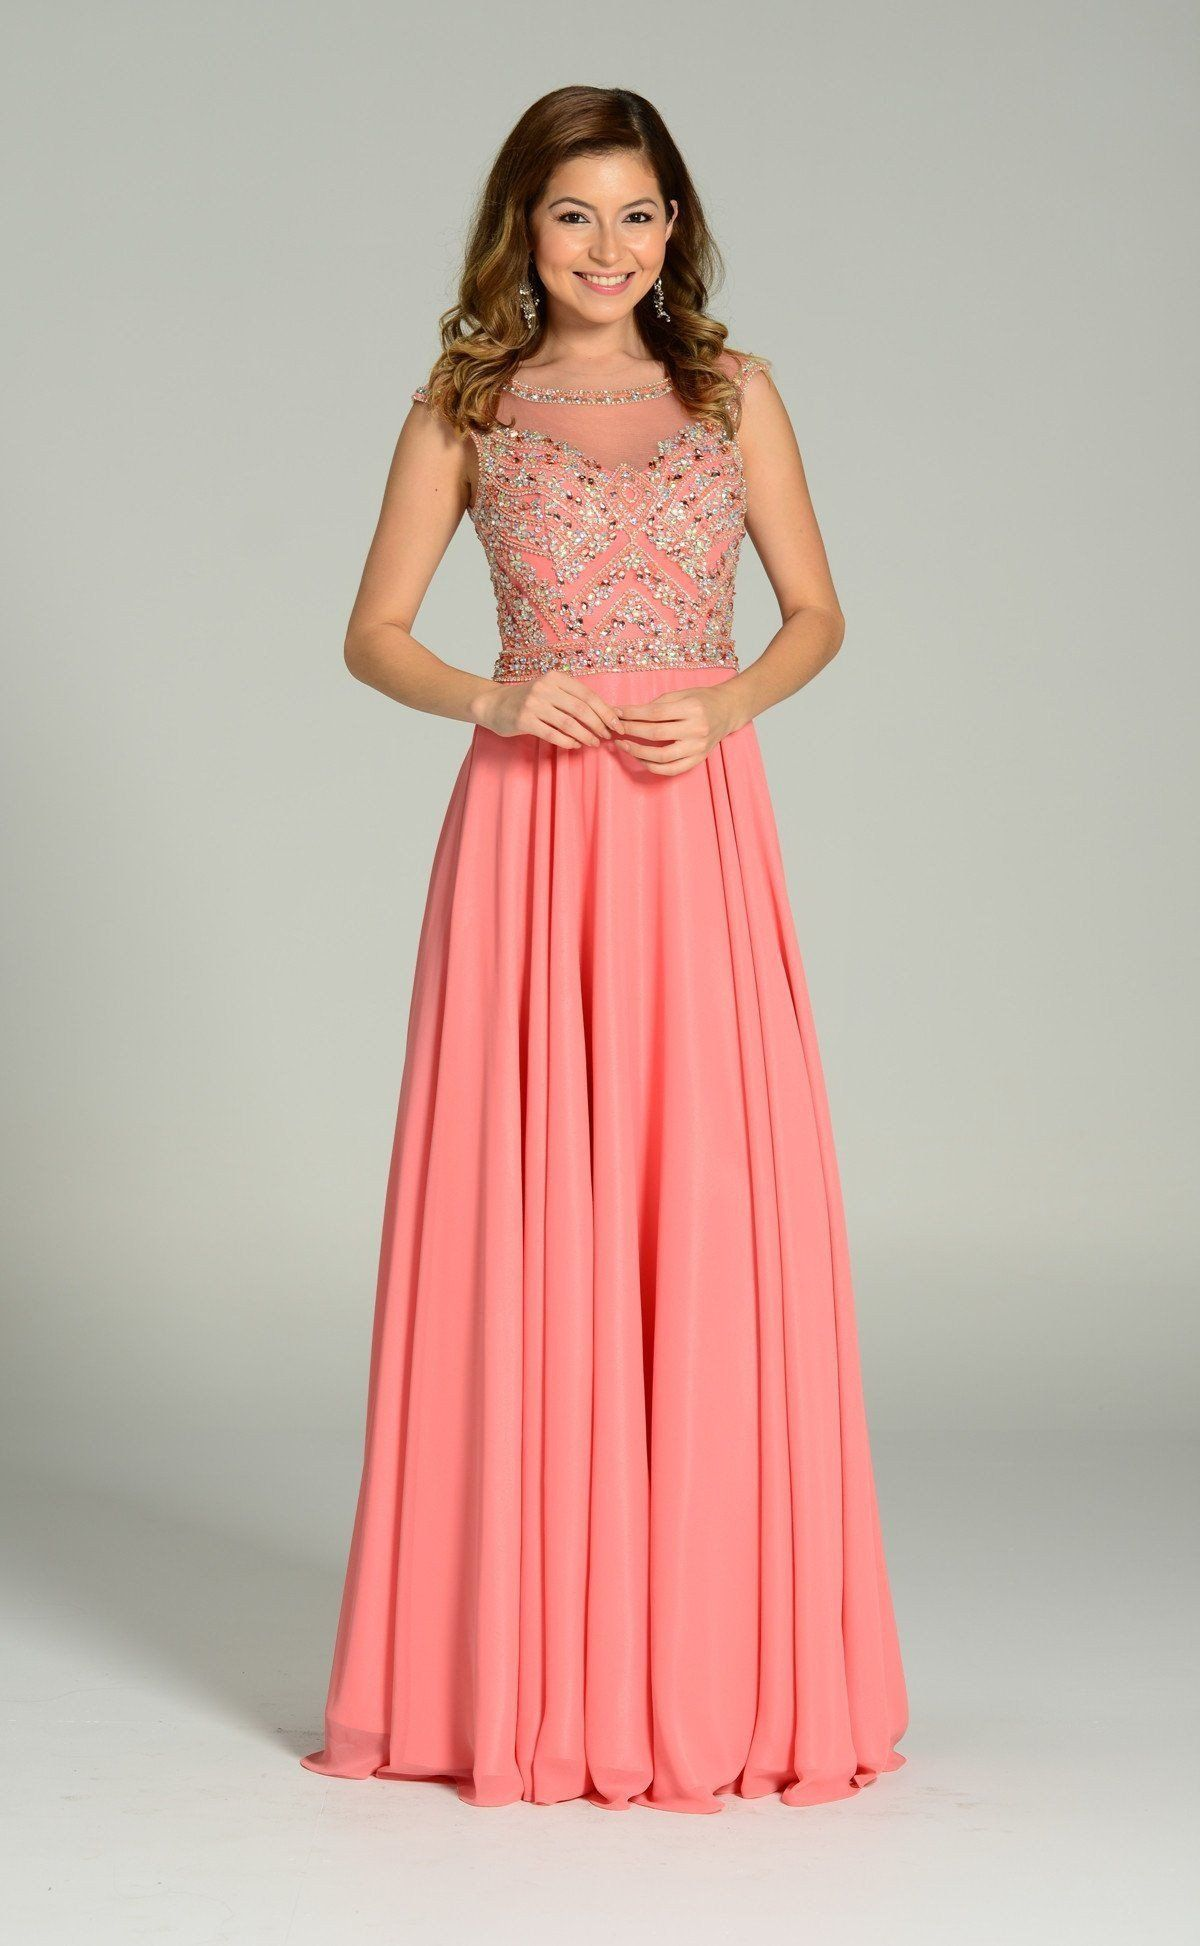 Fully beaded bodice long bridesmaids dress 101- 7250   Pinterest ...